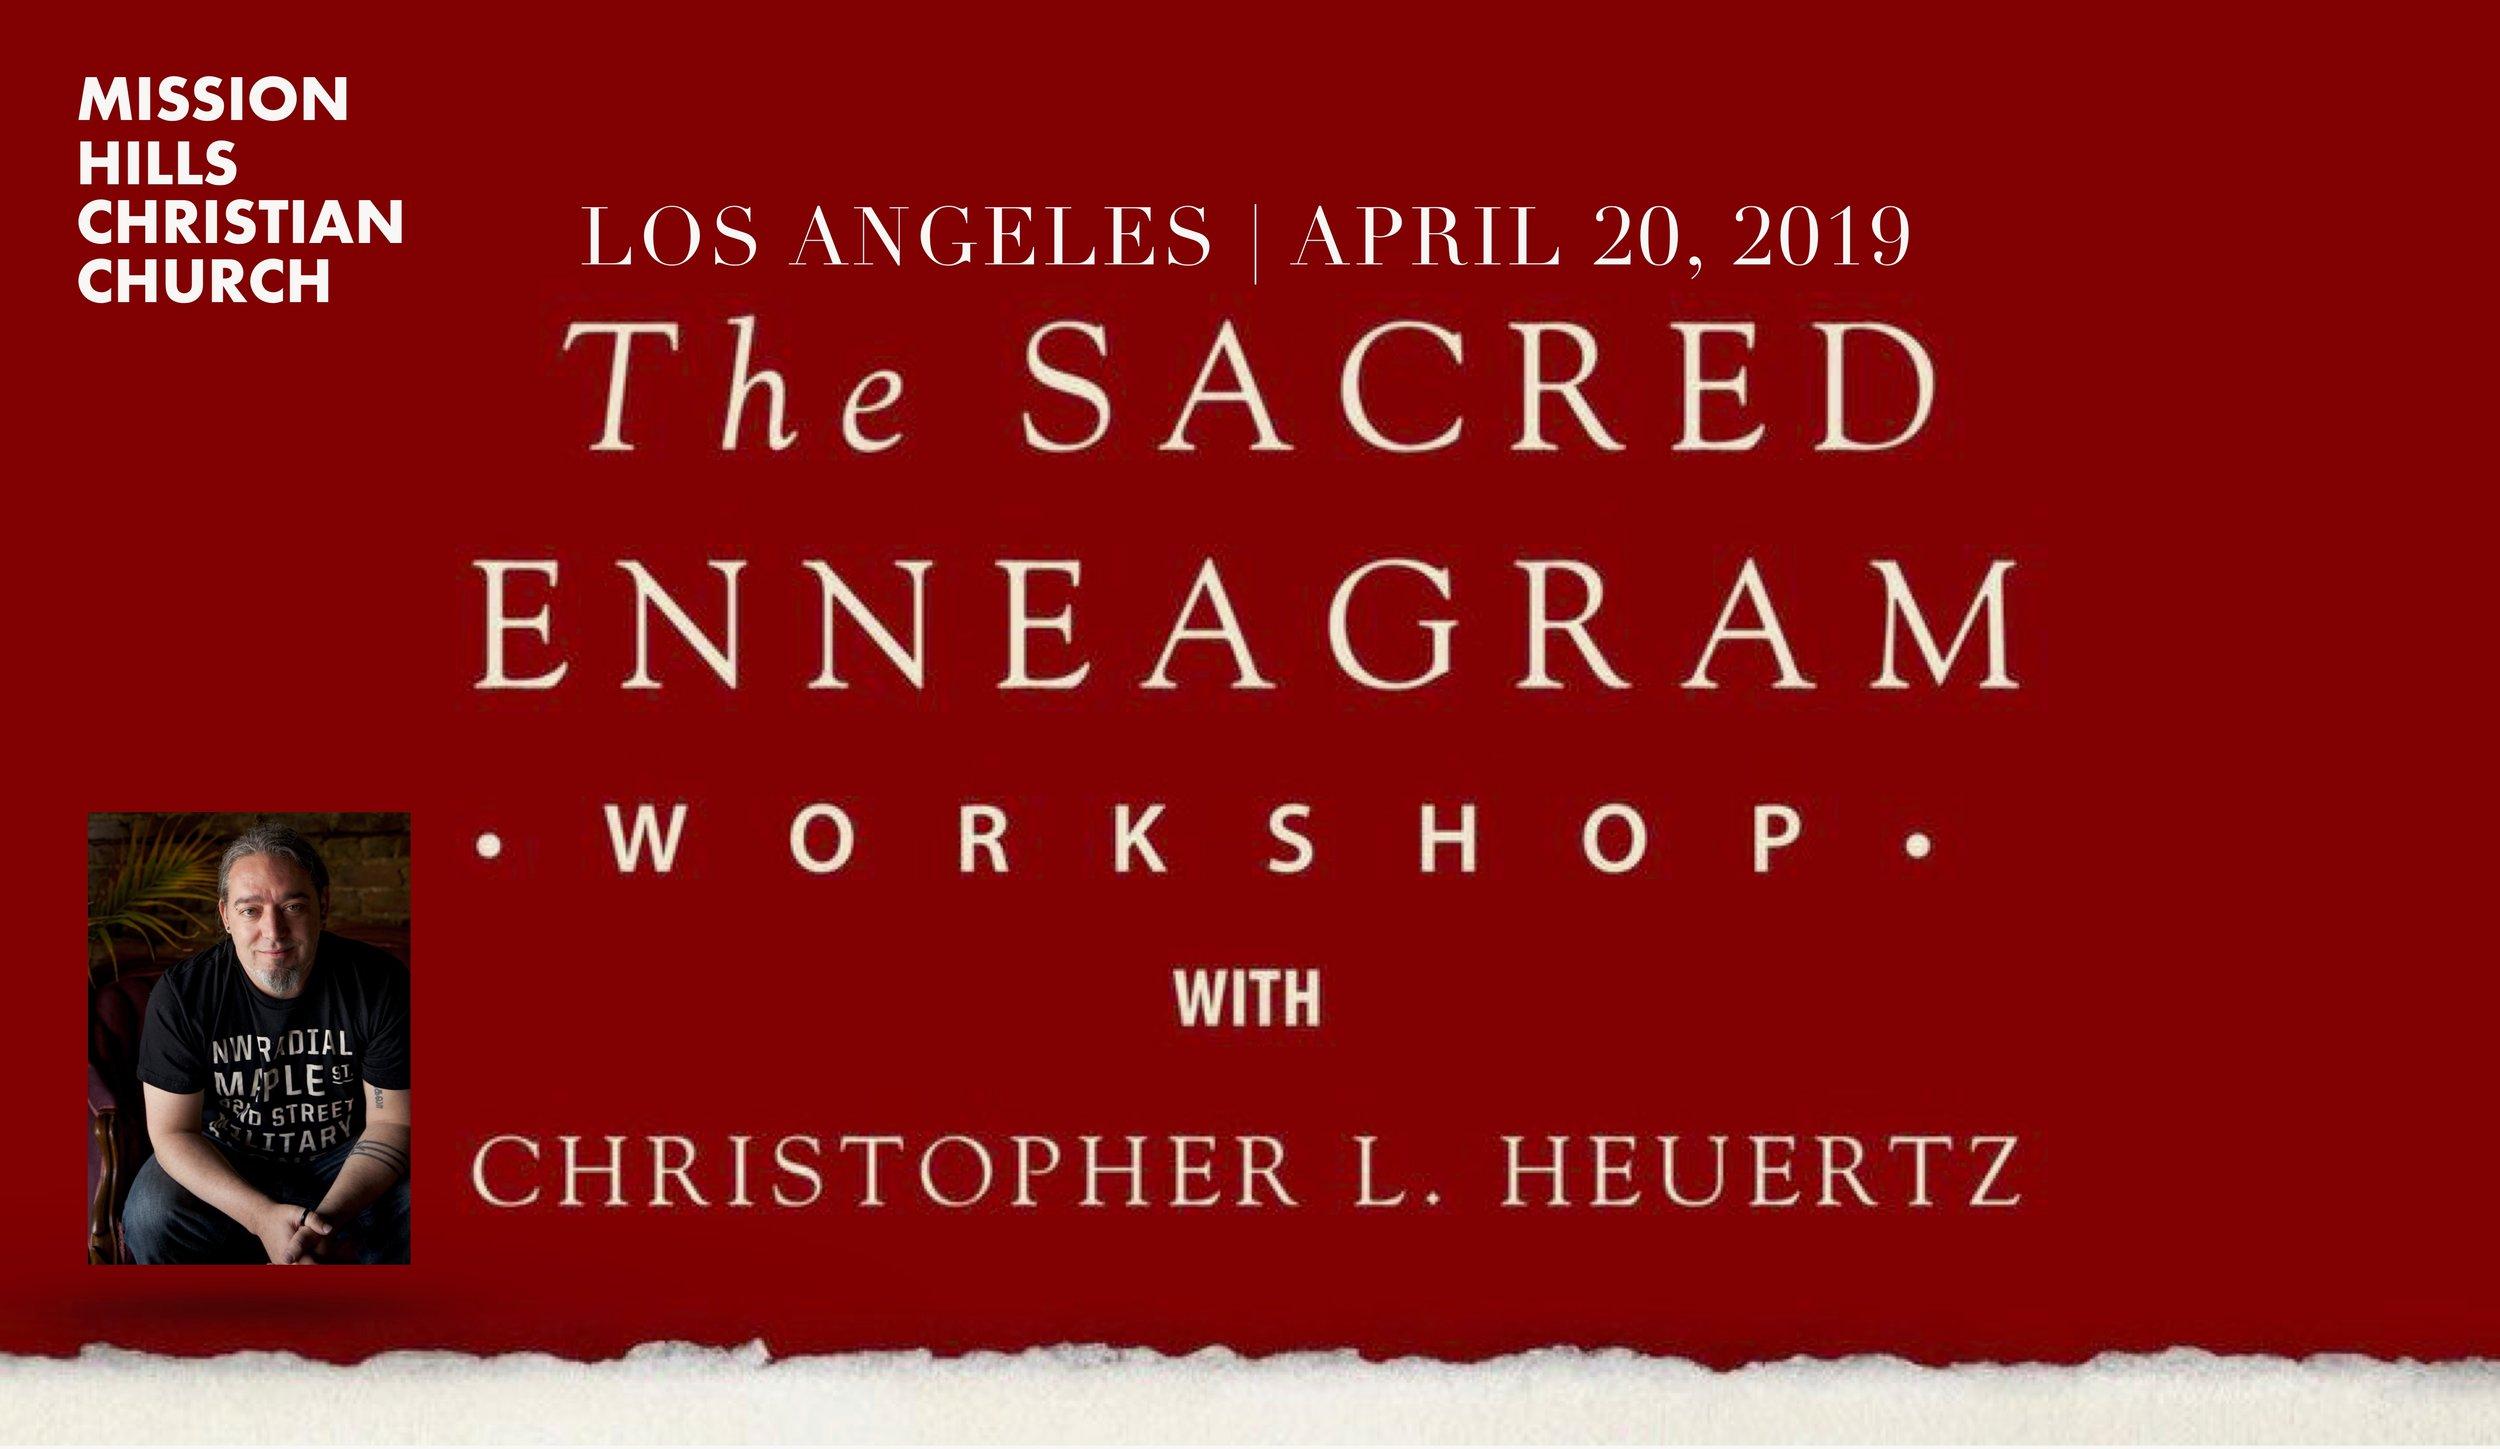 MISSION-HILLS-CHRISTIAN-CHURCH-SACRED-ENNEAGRAM-WORKSHOP-LOS-ANGELES-CALIFORNIA-JPEG.jpg